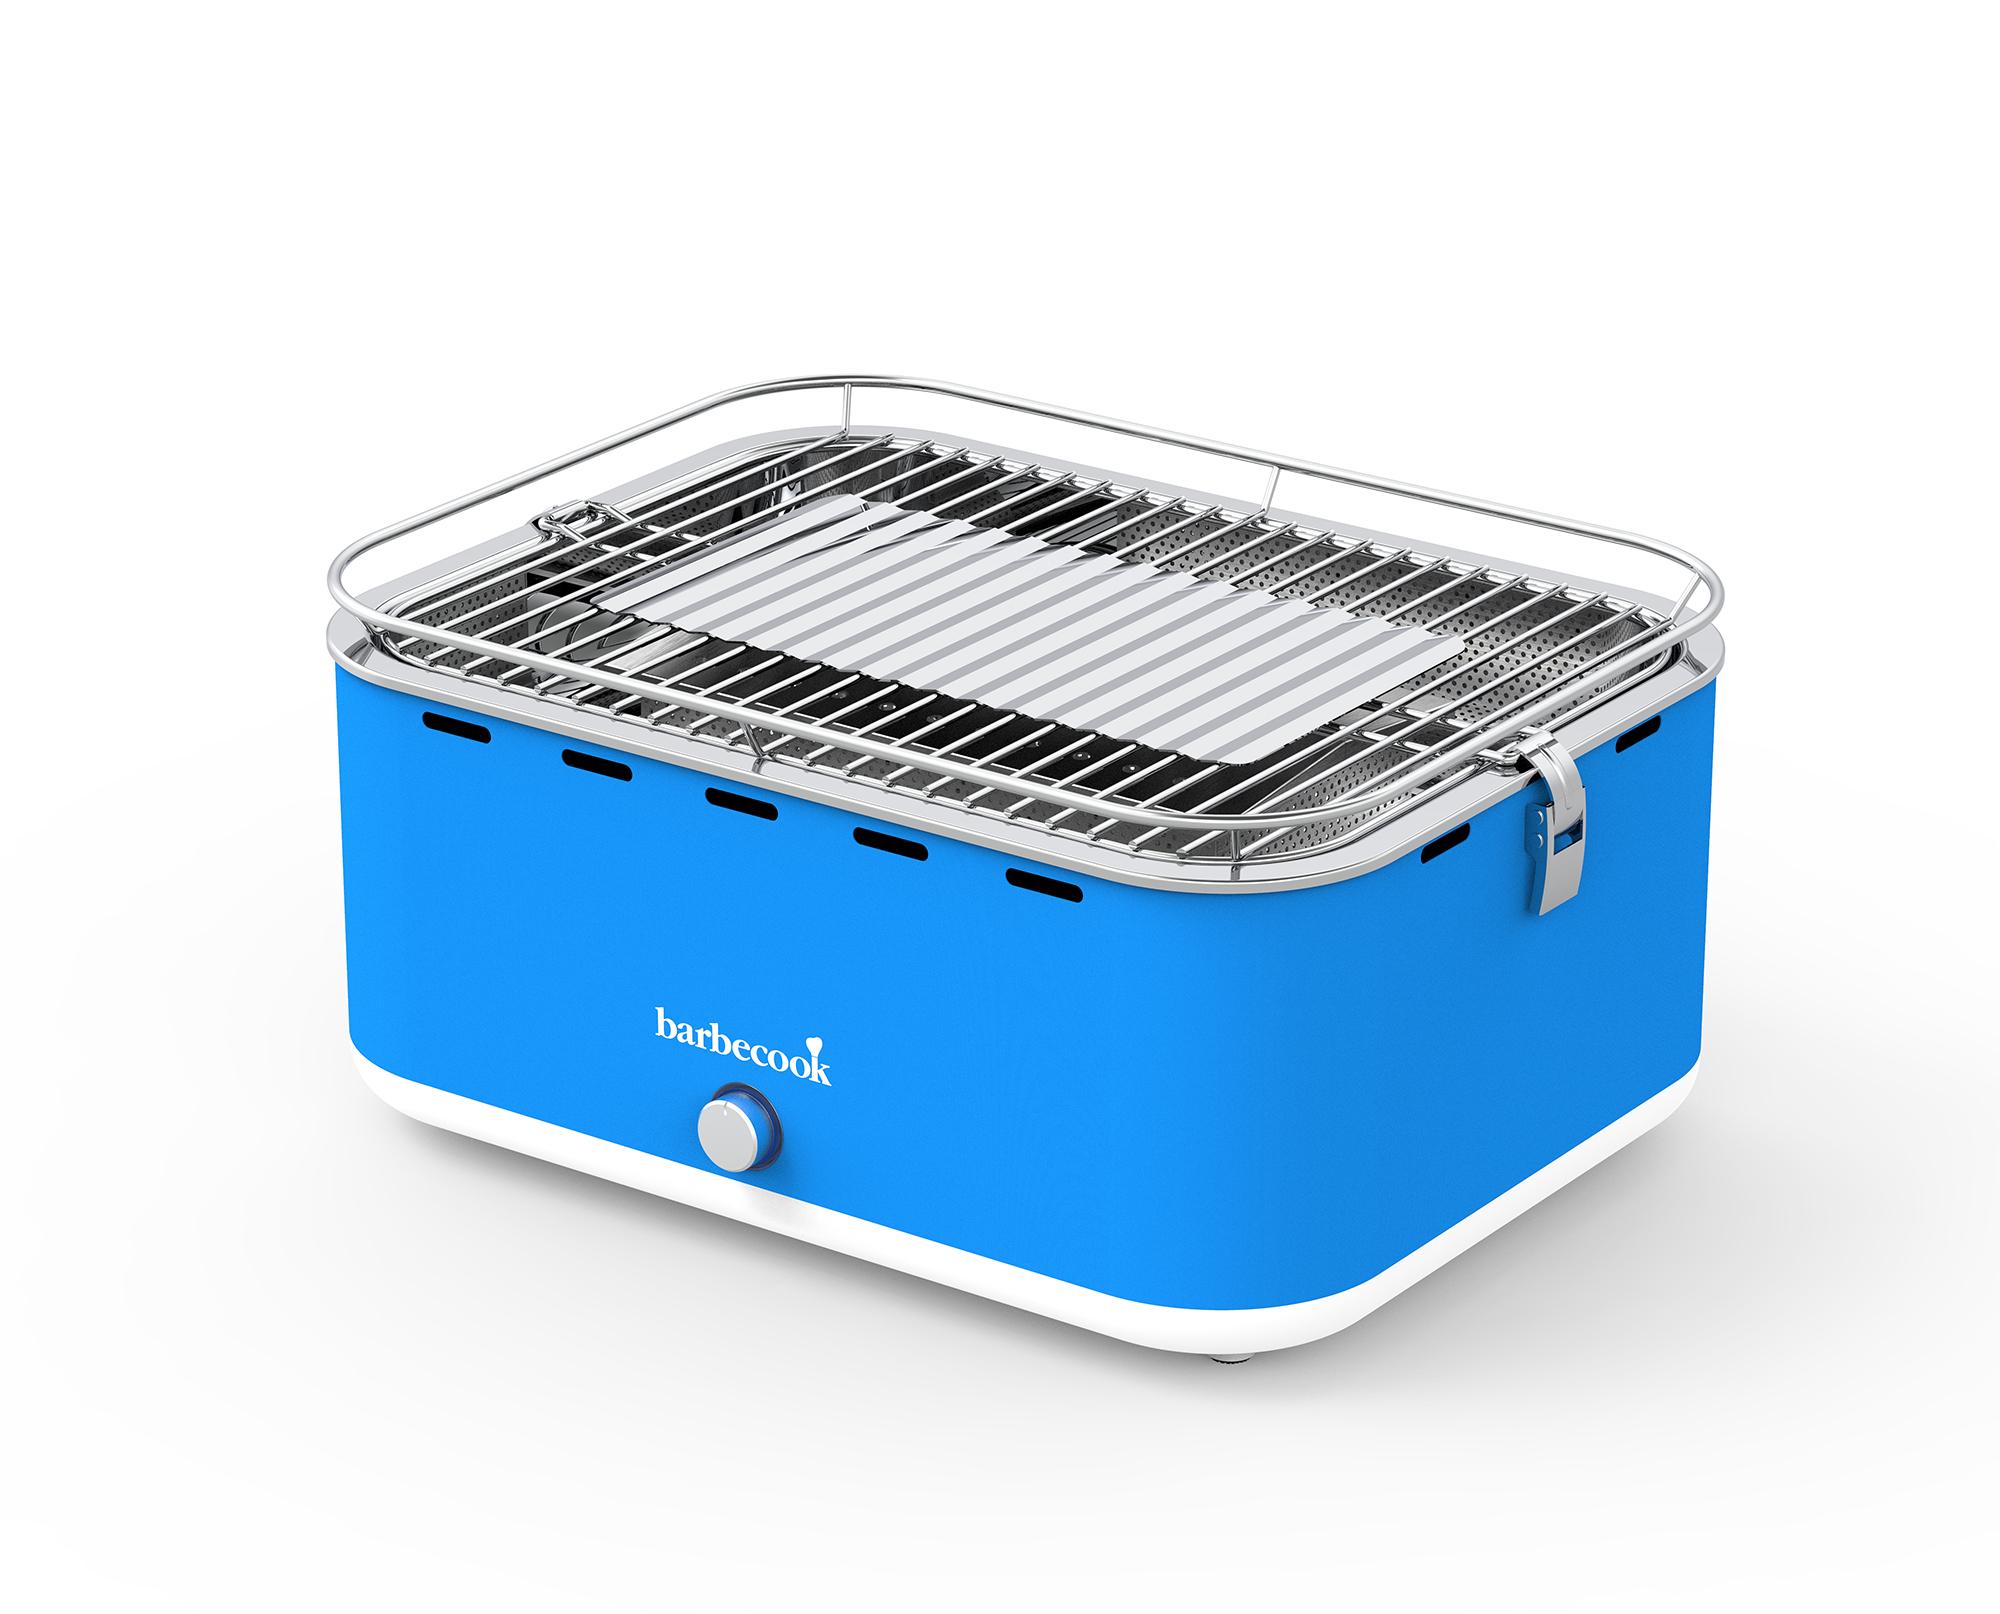 Barbecook Carlo - Sky Blue